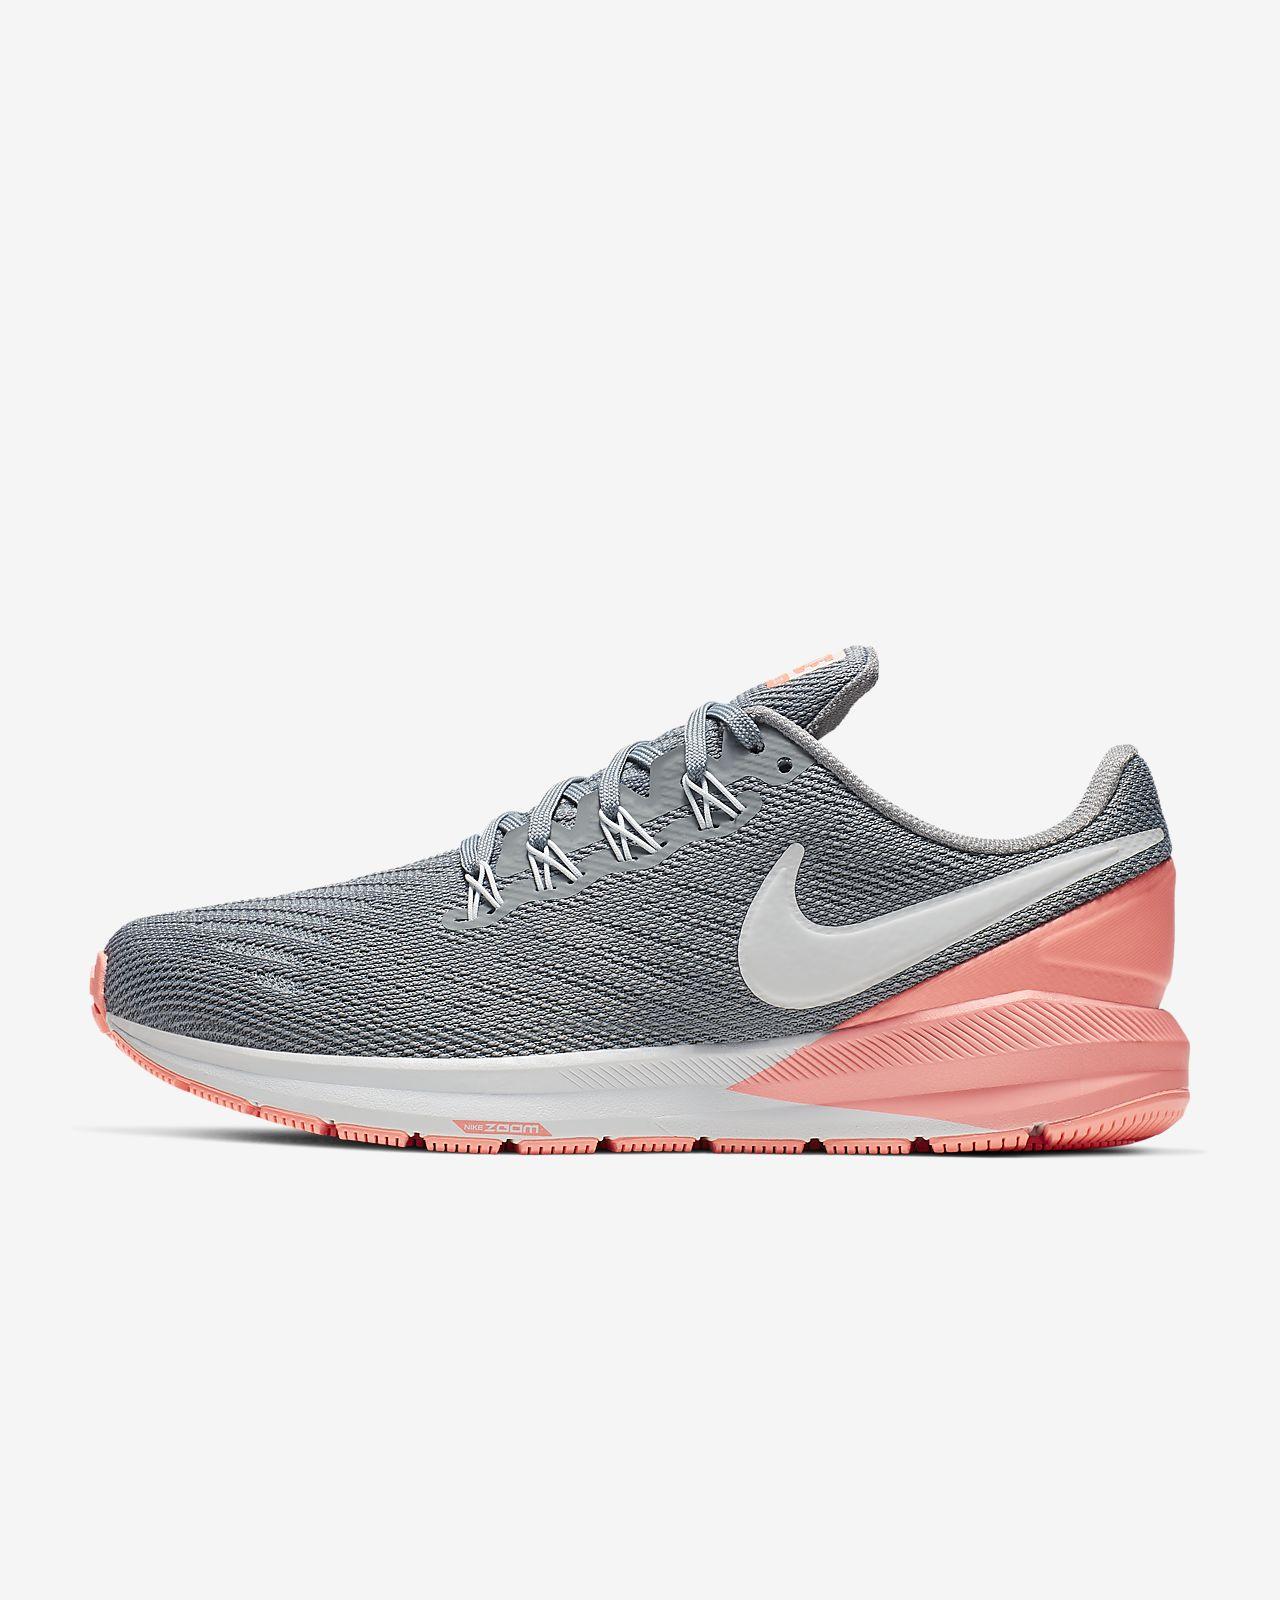 Calzado de running para mujer Nike Air Zoom Structure 22